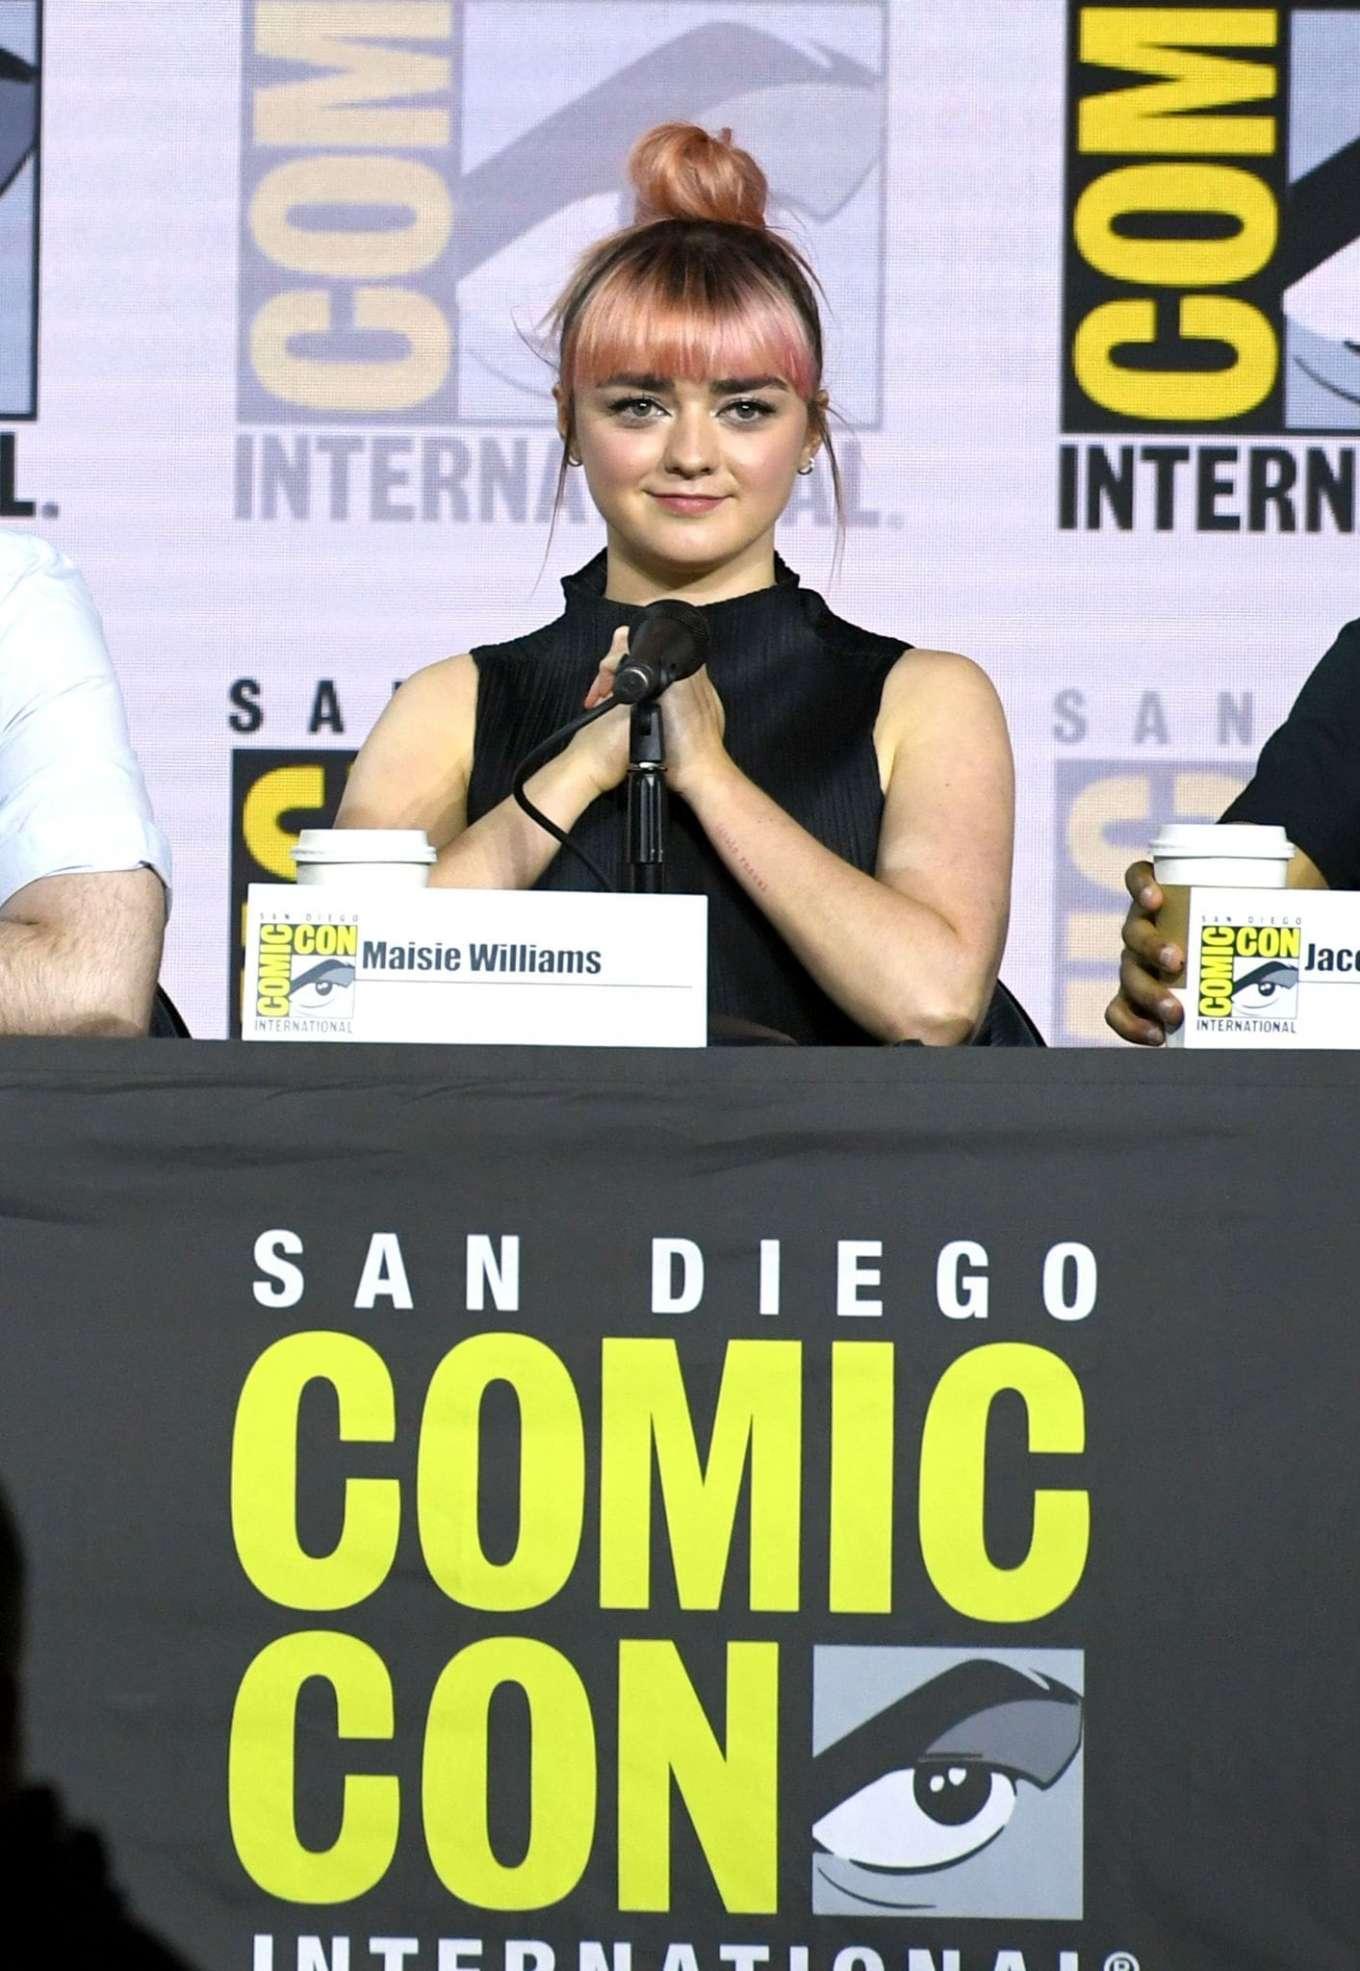 Maisie Williams 2019 : Maisie Williams – Game of Thrones Panel at Comic Con San Diego 2019-02